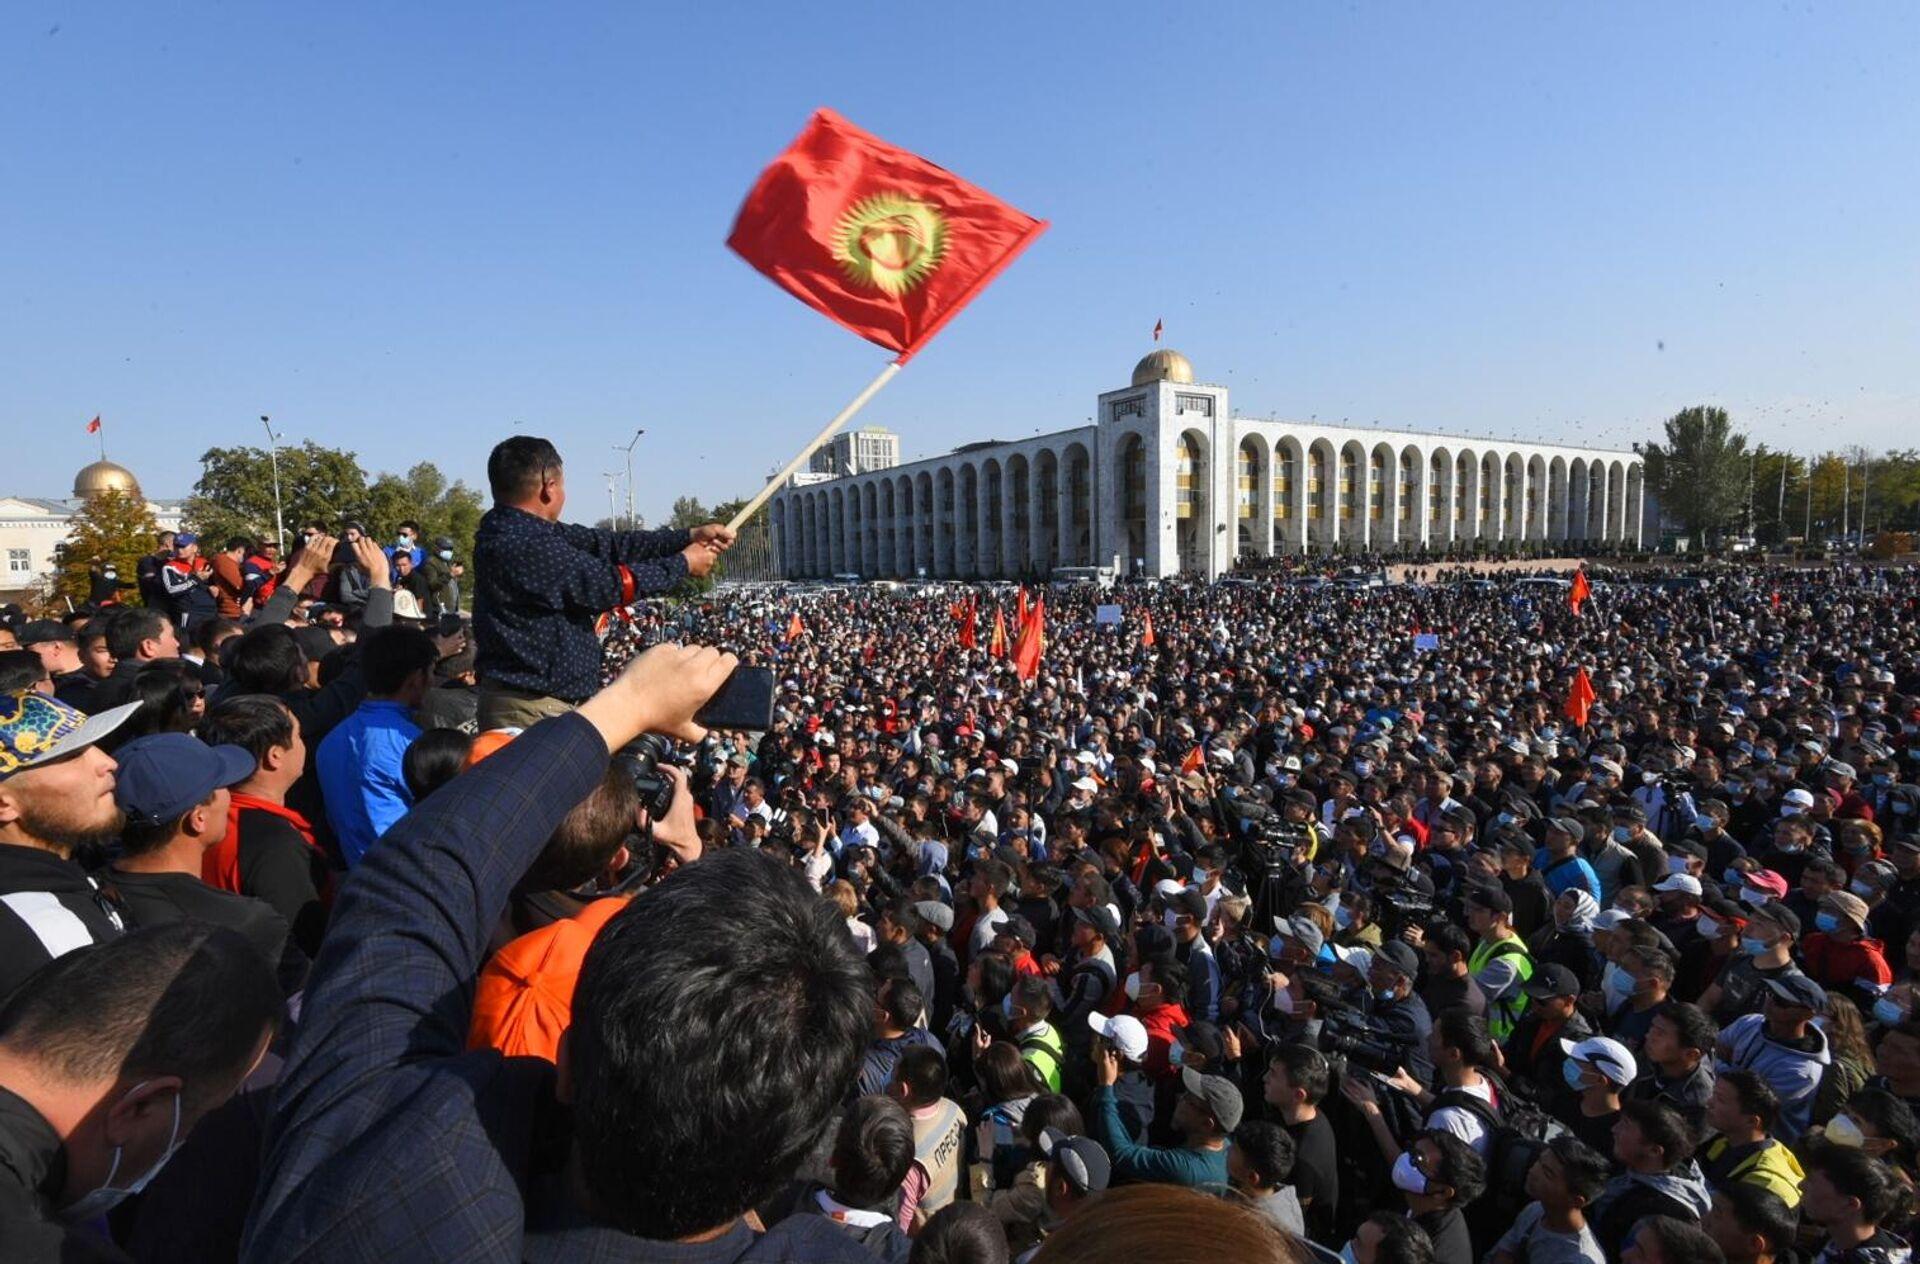 Участники акции протеста в Бишкеке - РИА Новости, 1920, 20.11.2020